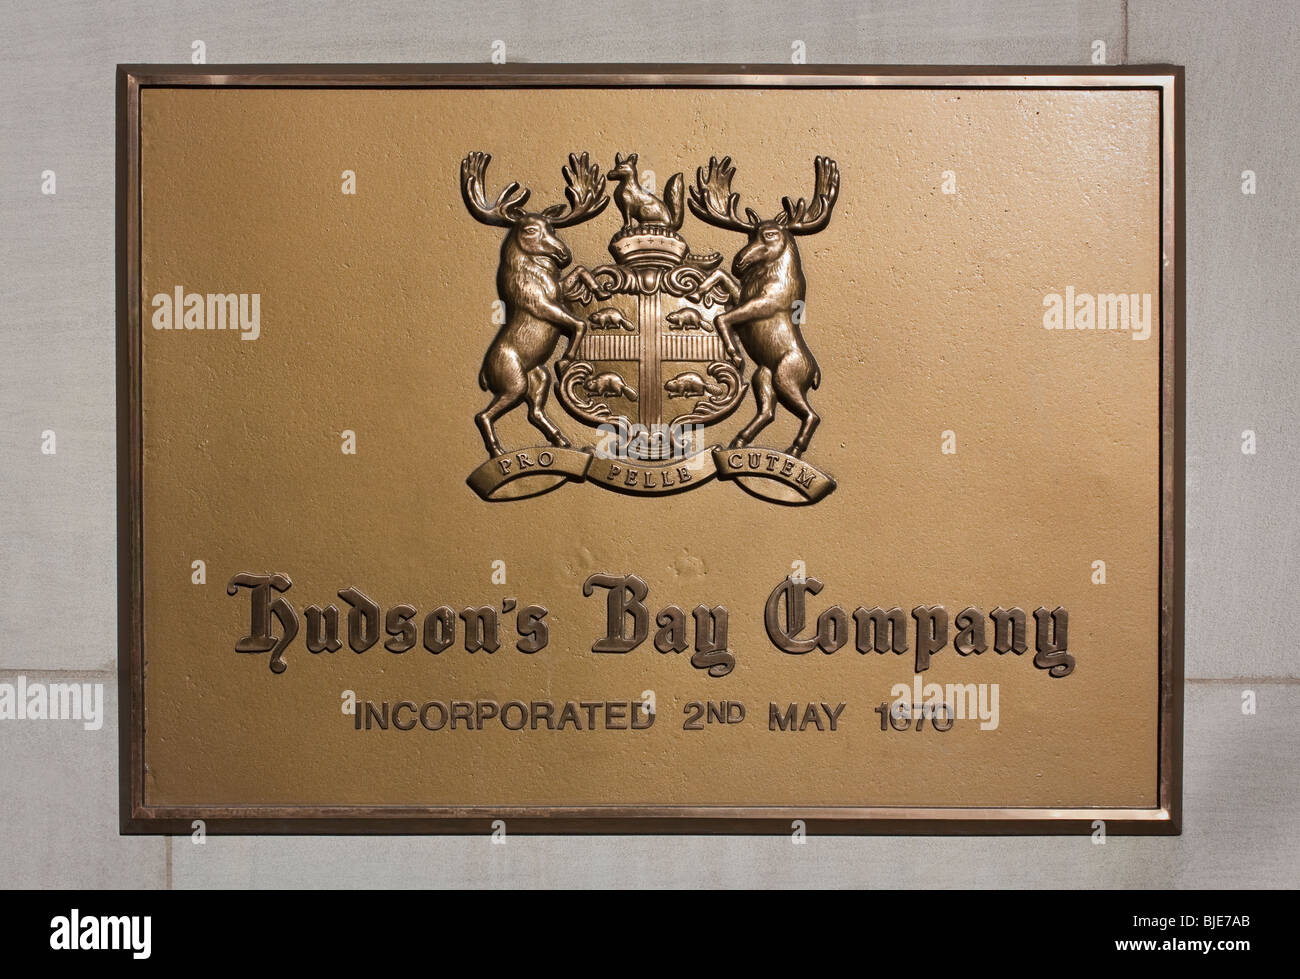 Hudsons bay company moose logo plaque stock photo 28587283 alamy hudsons bay company moose logo plaque buycottarizona Choice Image